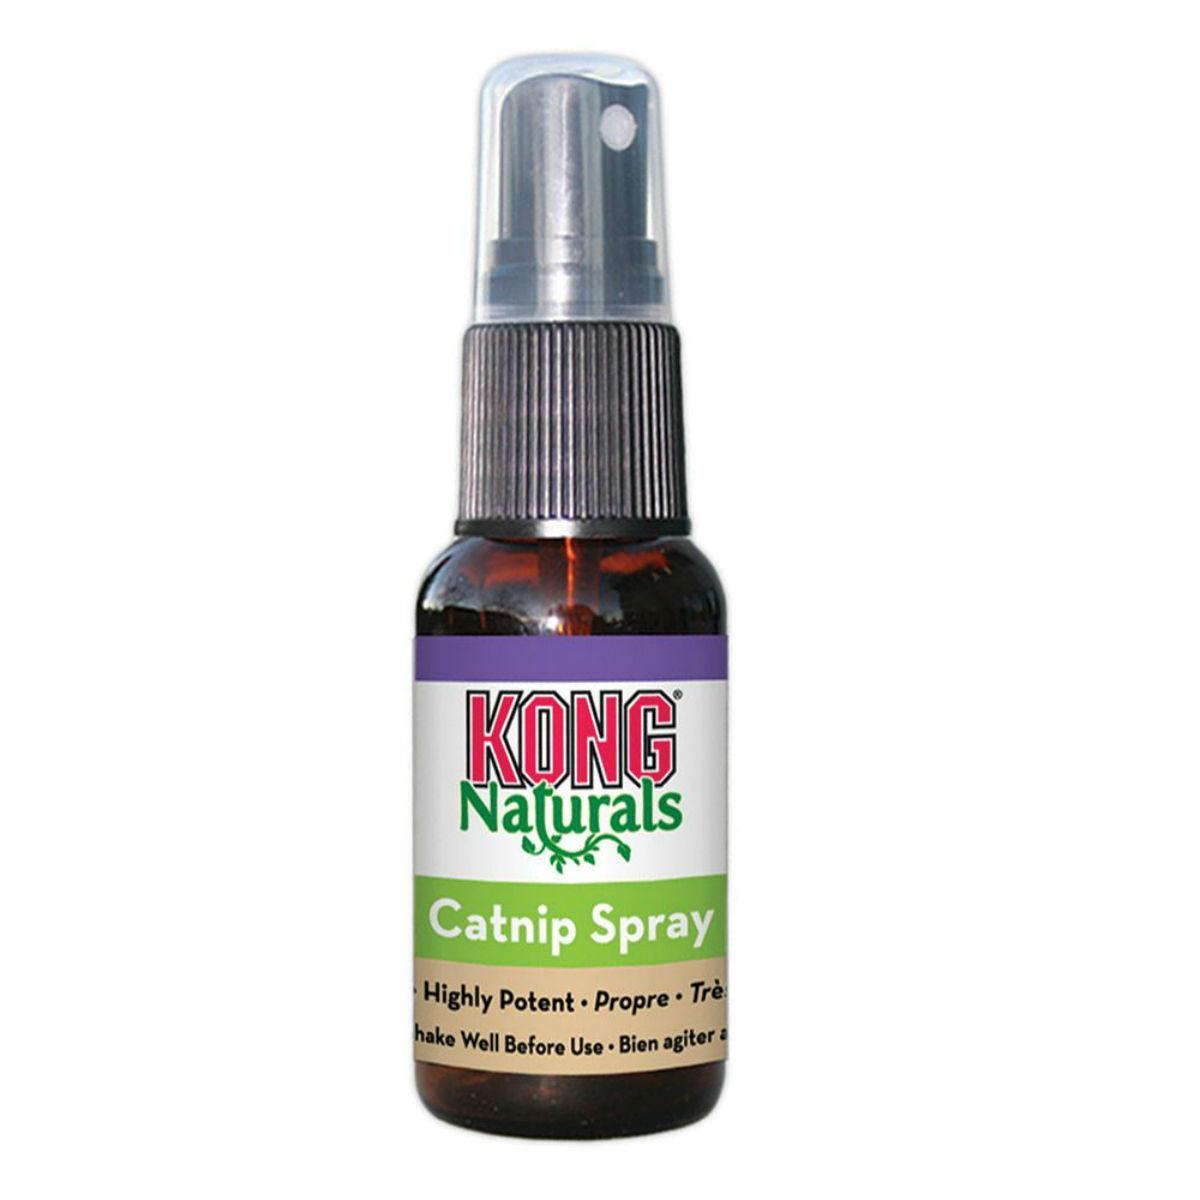 KONG Naturals Premium Catnip Spray